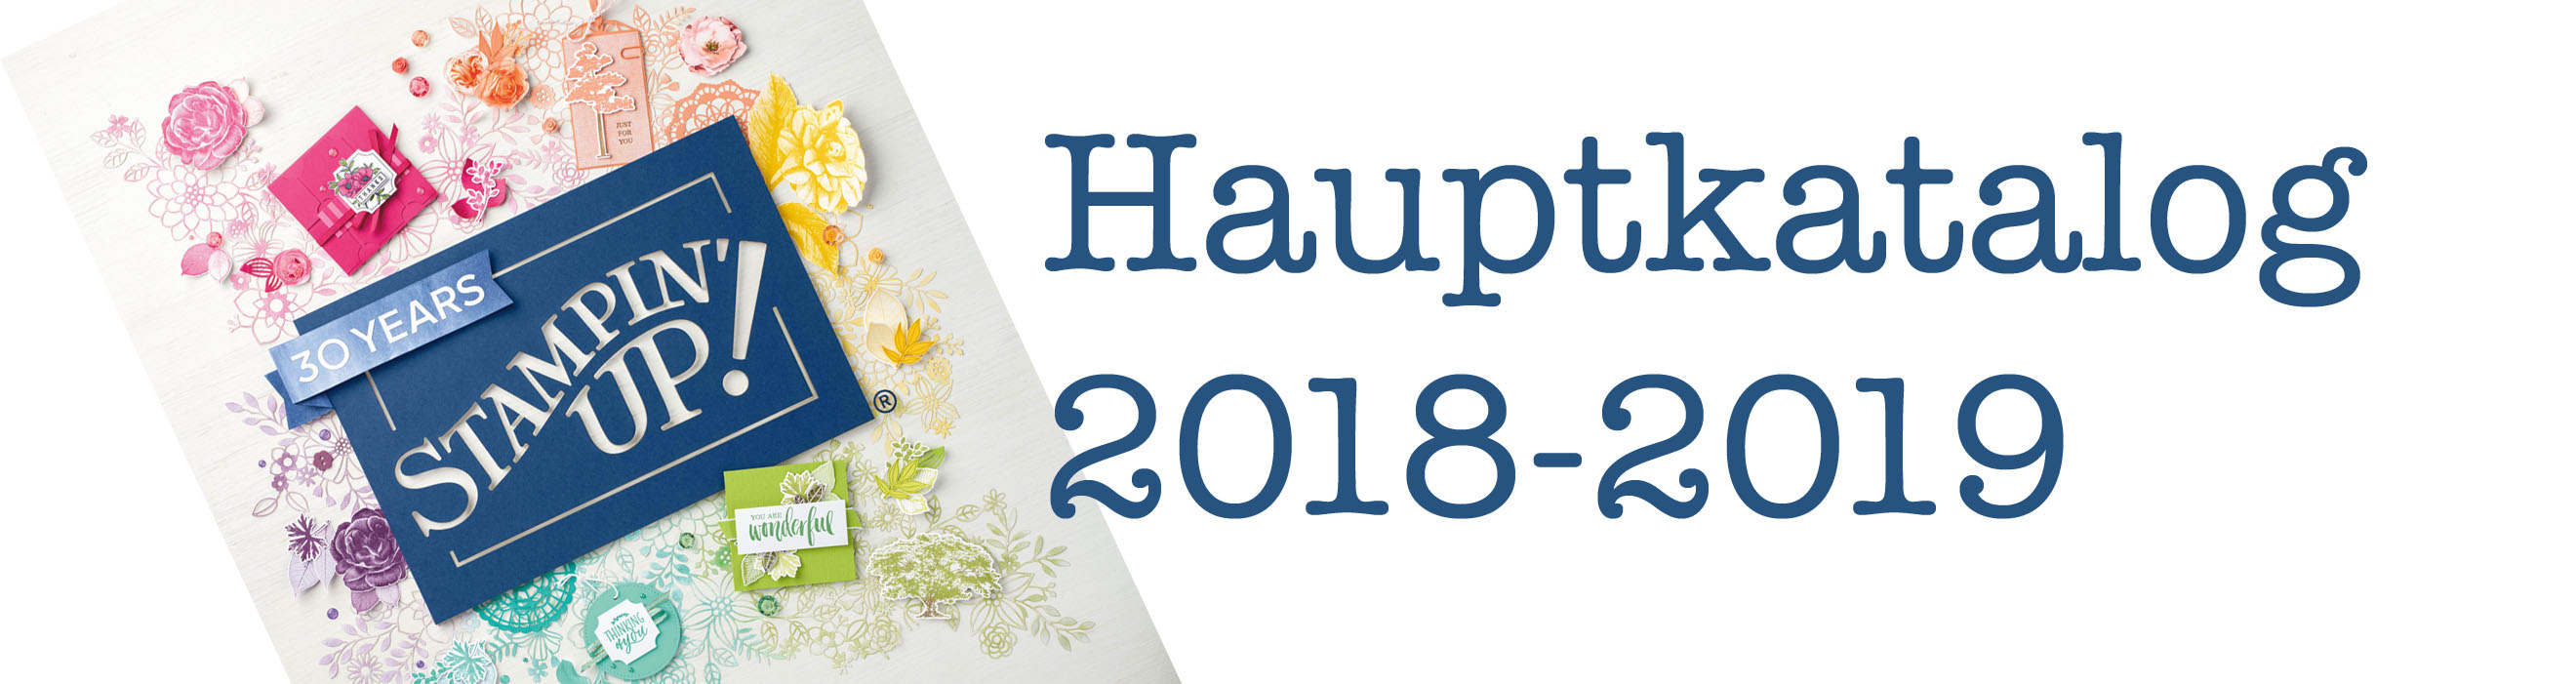 Hauptkatalog 2018-2019